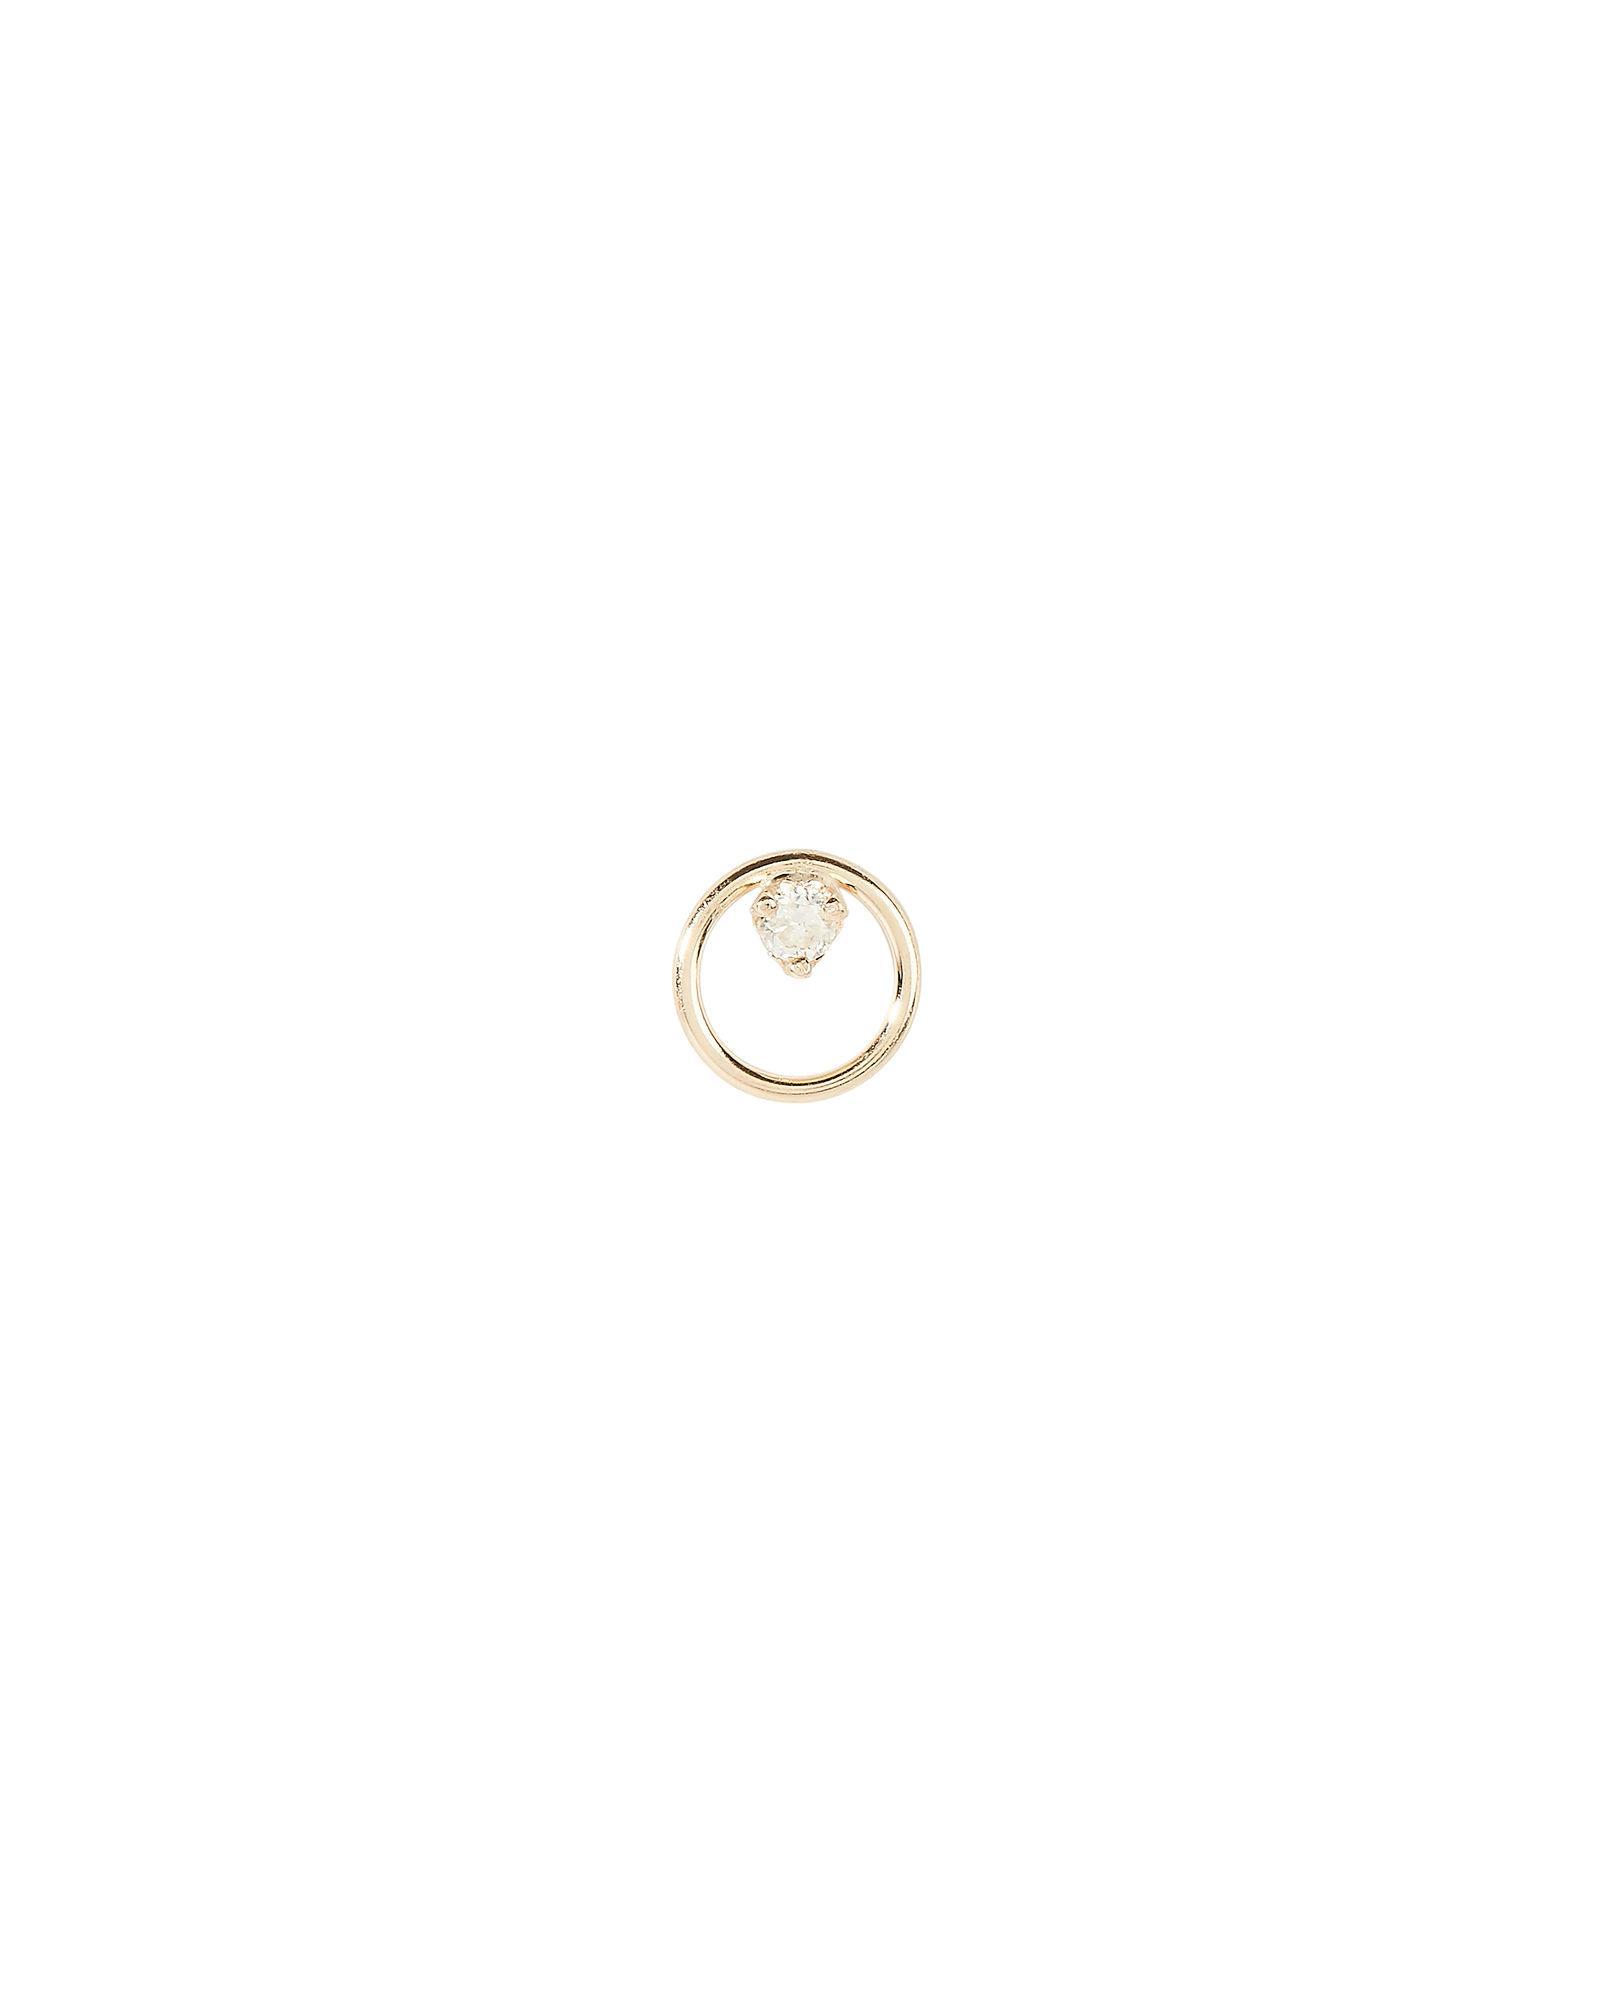 ZoË Chicco Single Diamond Circle Stud In Gold